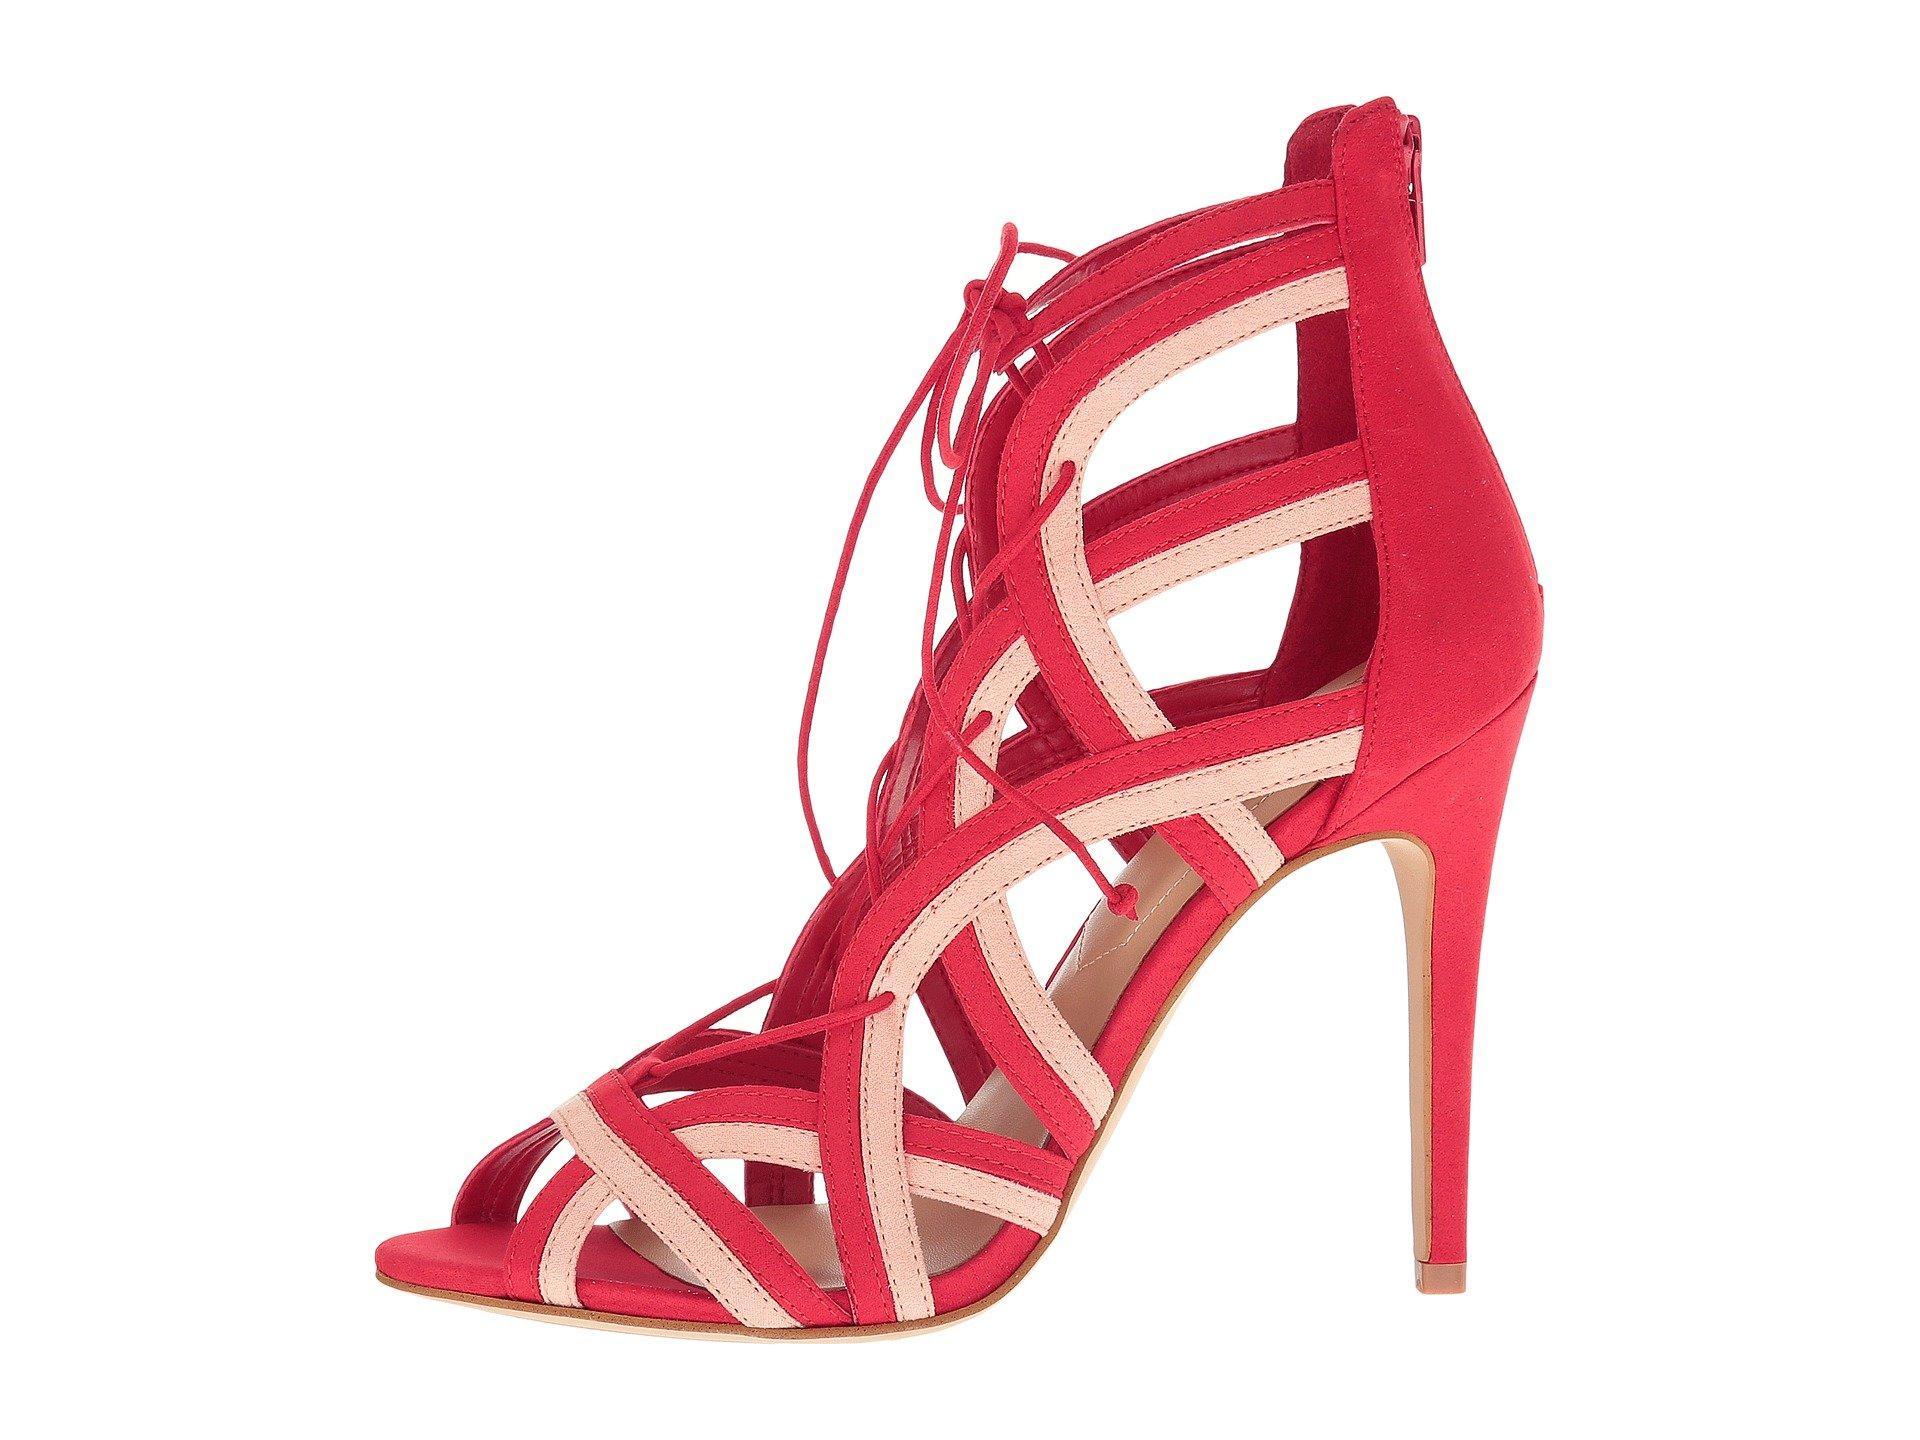 Aldo Womens Shaylla Peep Toe Ankle Strap Size Classic Pumps Light Pink Size Strap 8.0 83cb96